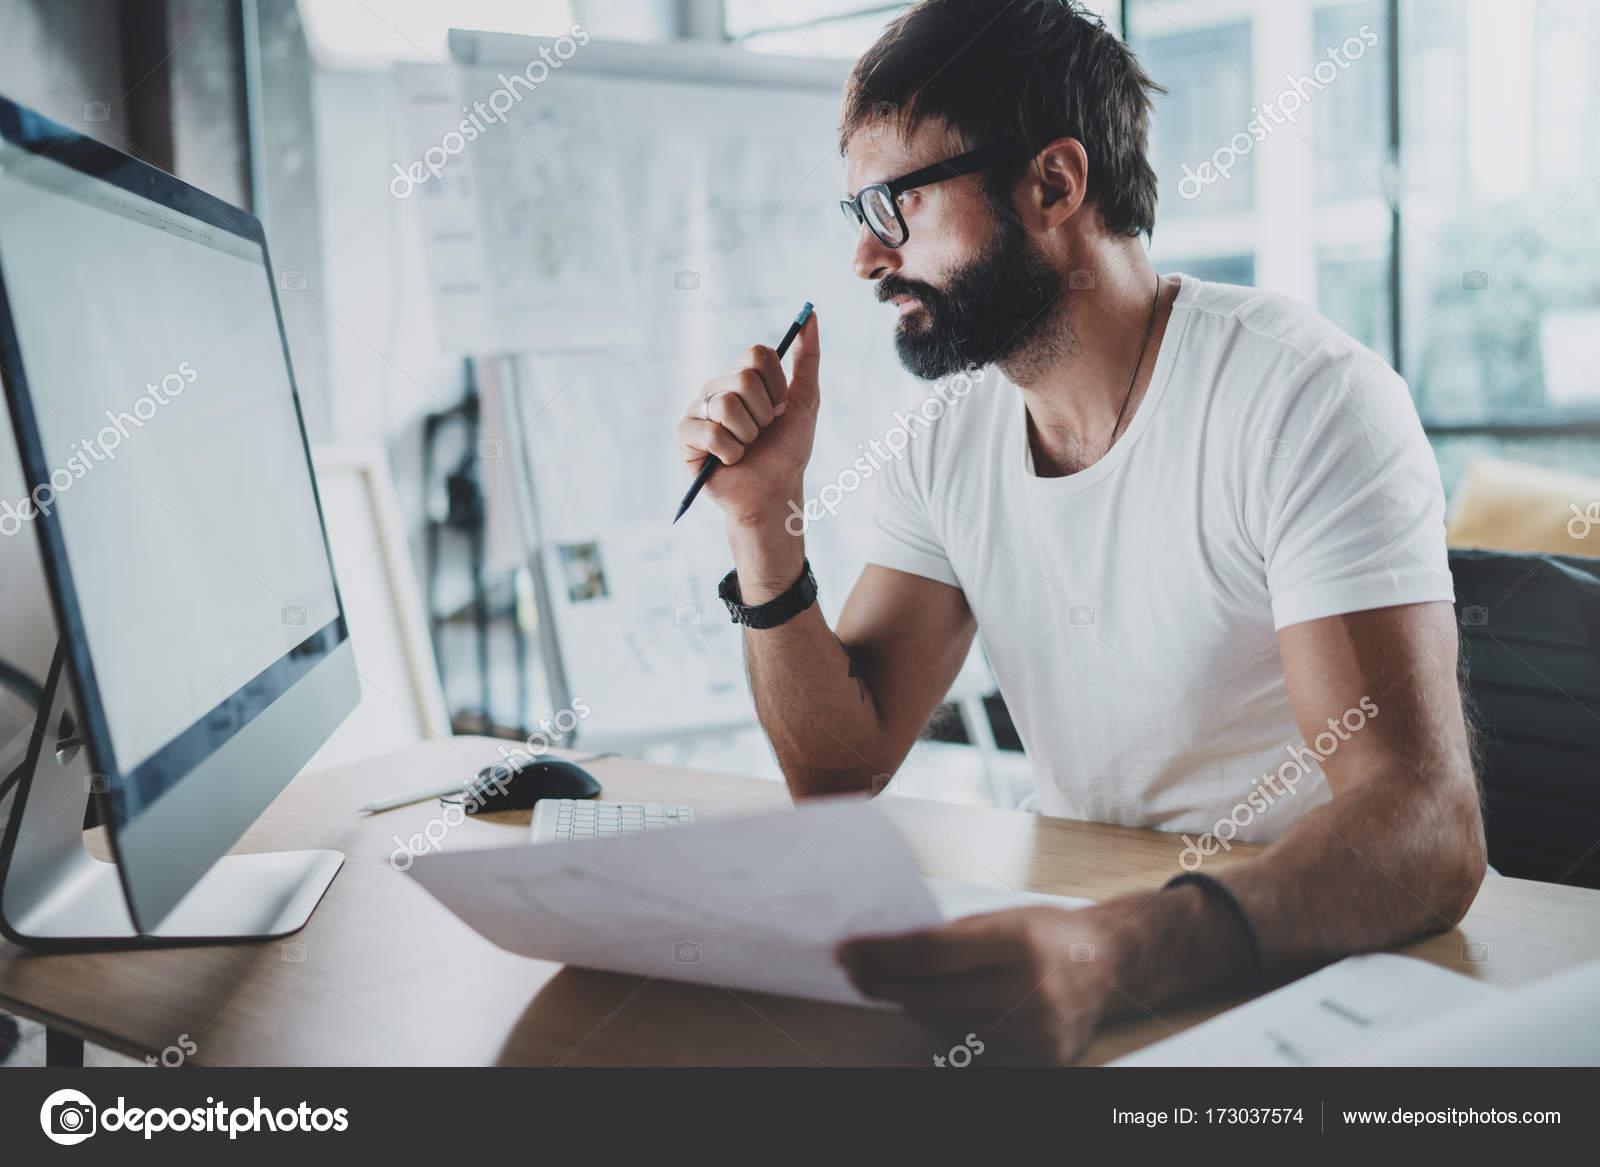 Barbu hipster professionnel portant des lunettes au loft moderne